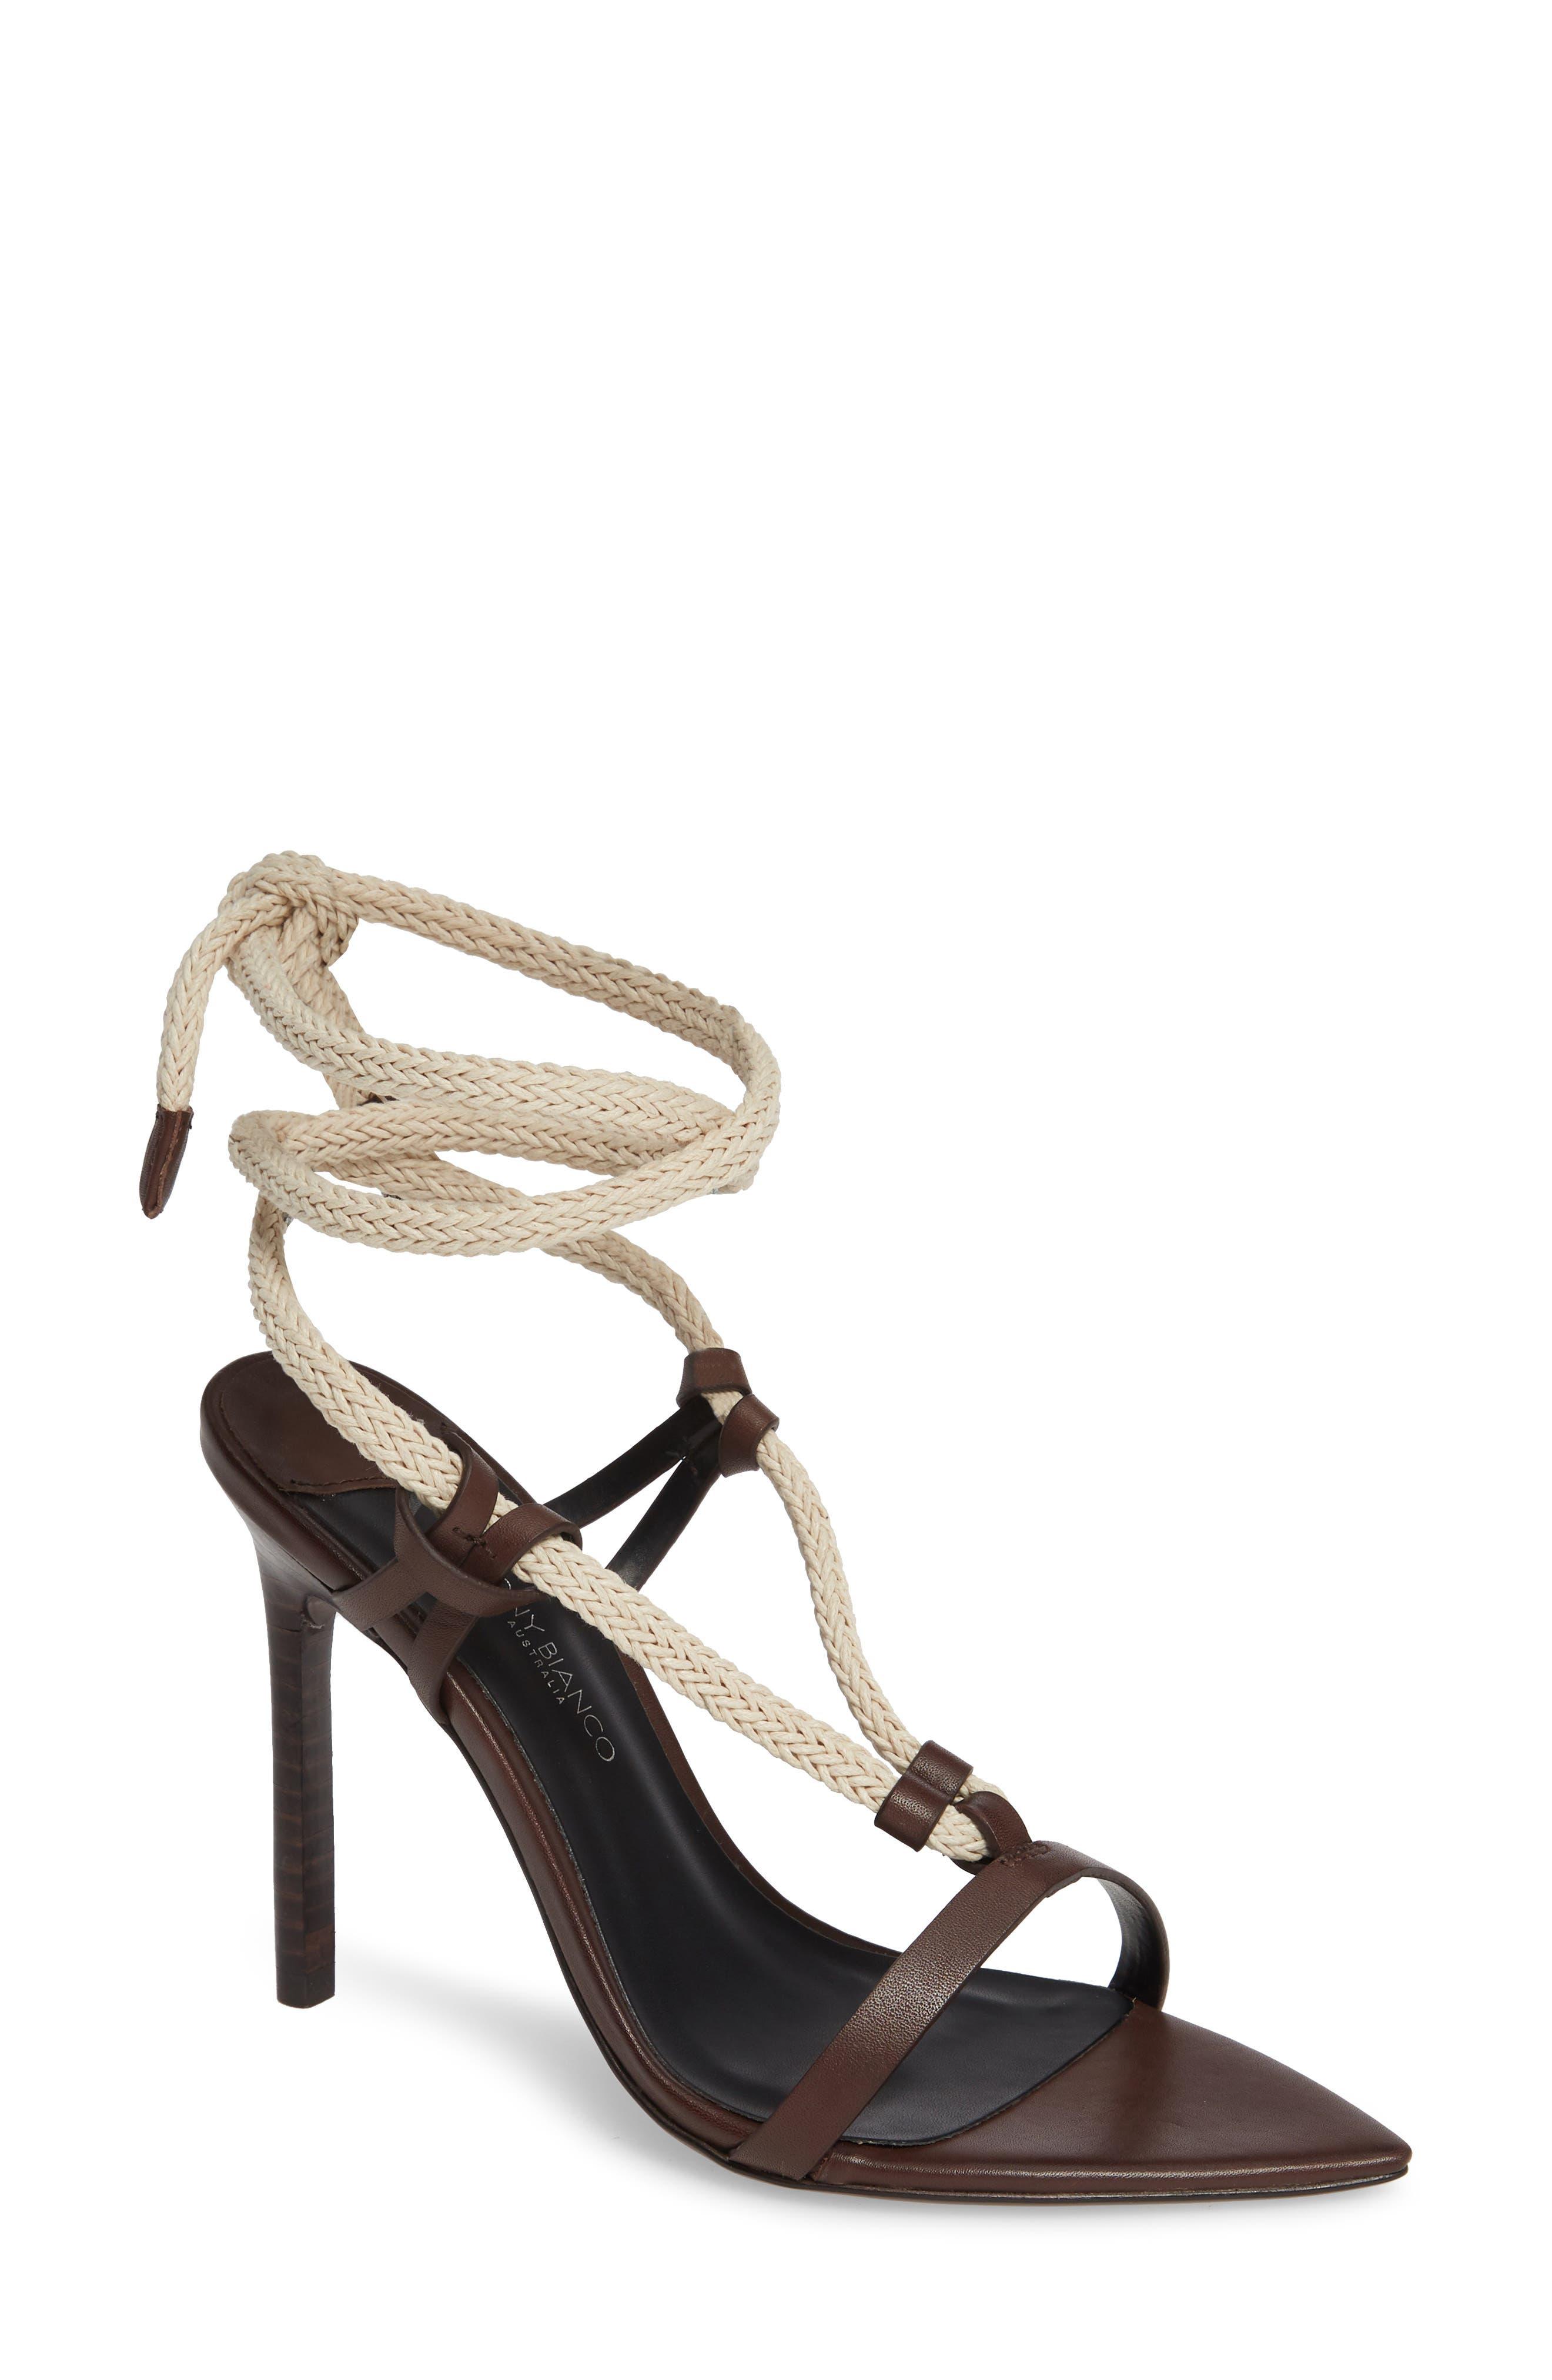 Manu Roped Sandal in Choc Como Leather